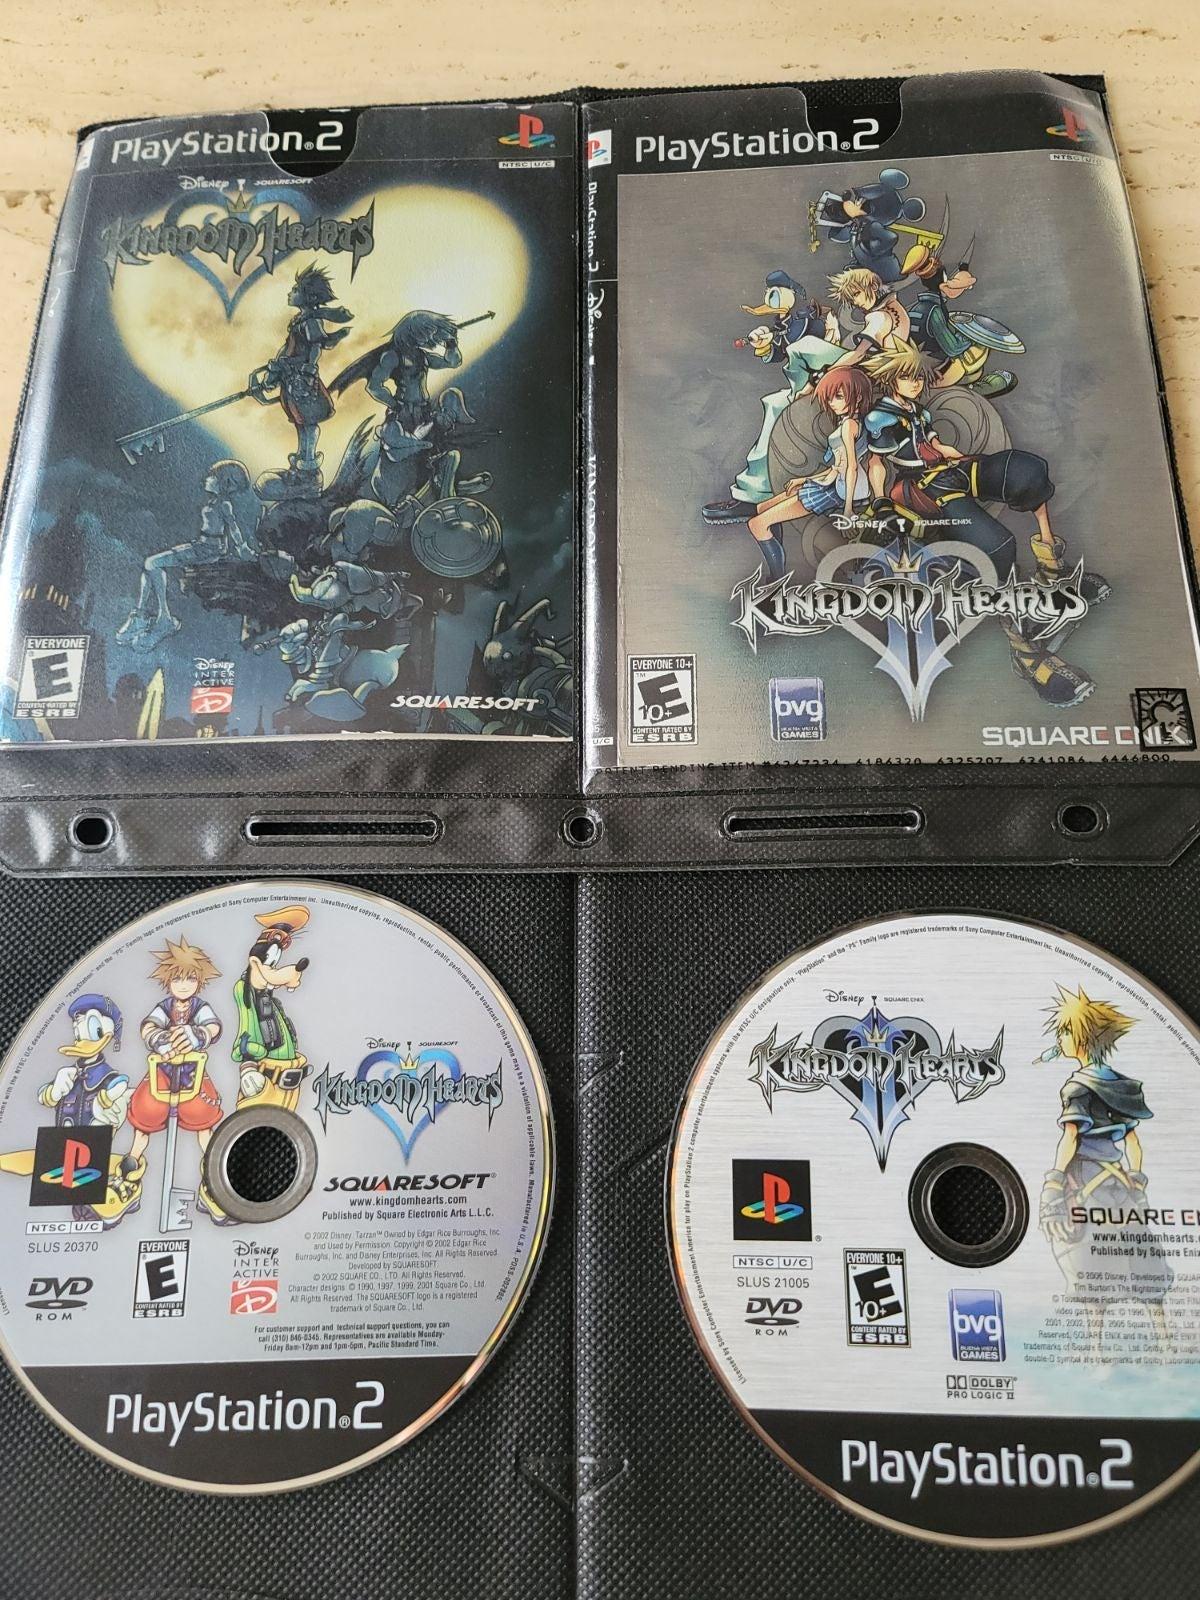 Playstation 2 Kingdom Hearts Bundle